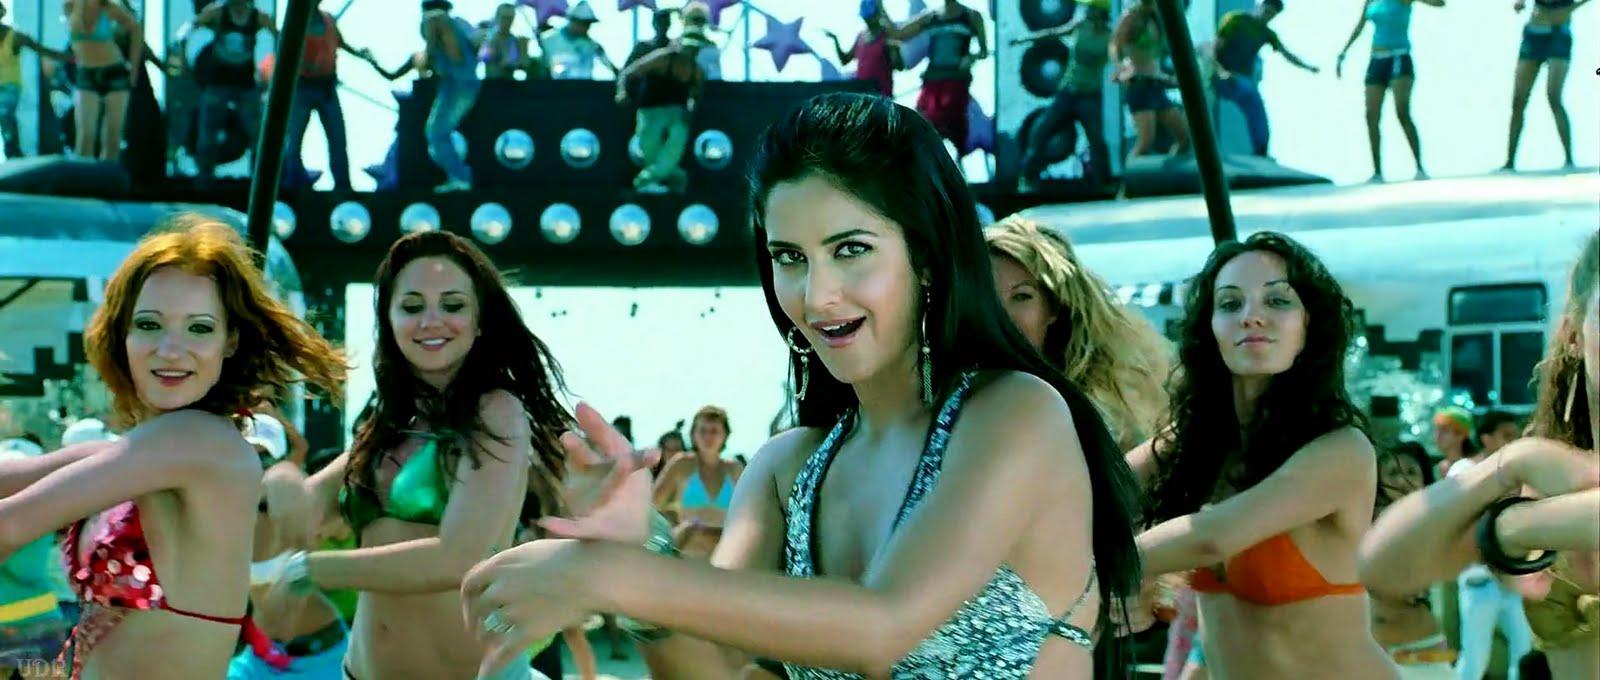 Sexy lady khwab dekha mp3 song